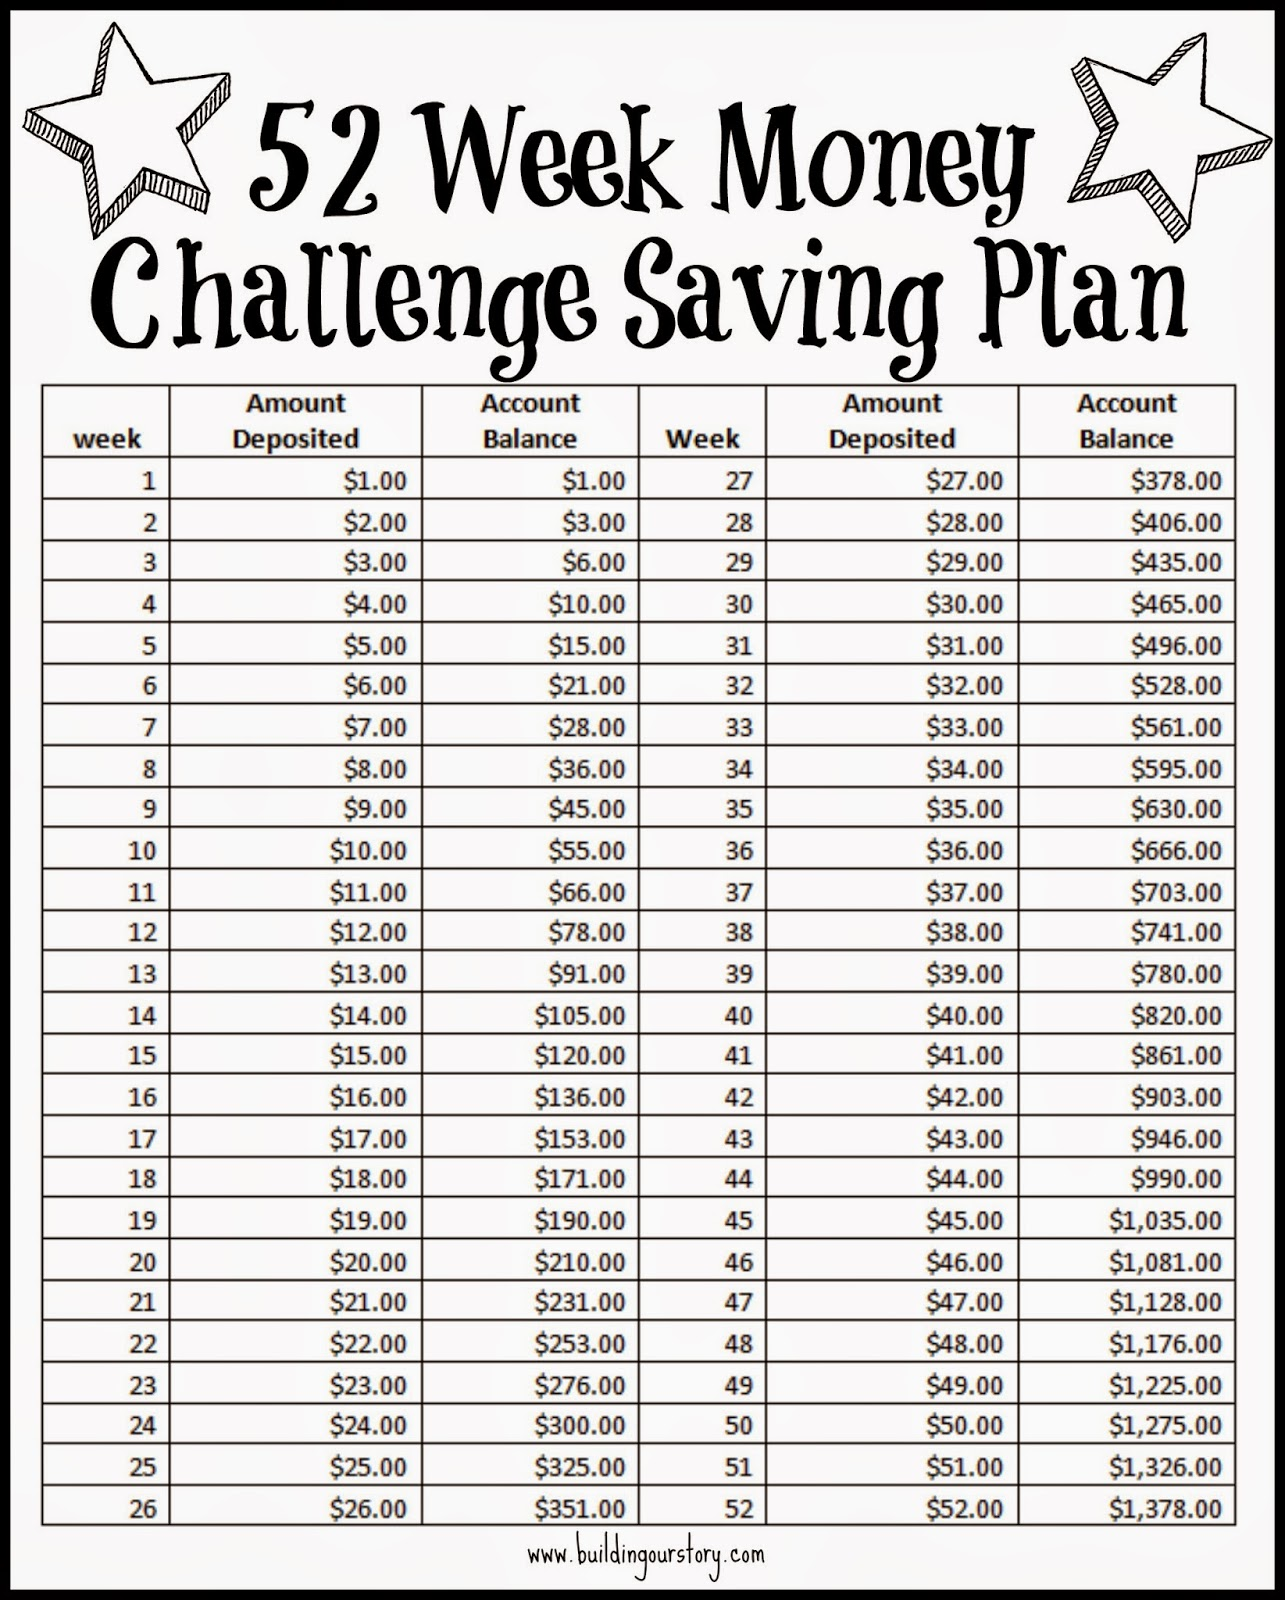 ilze 39 s adoption journey let 39 s start 2016 with 52 week money challenge saving plan. Black Bedroom Furniture Sets. Home Design Ideas